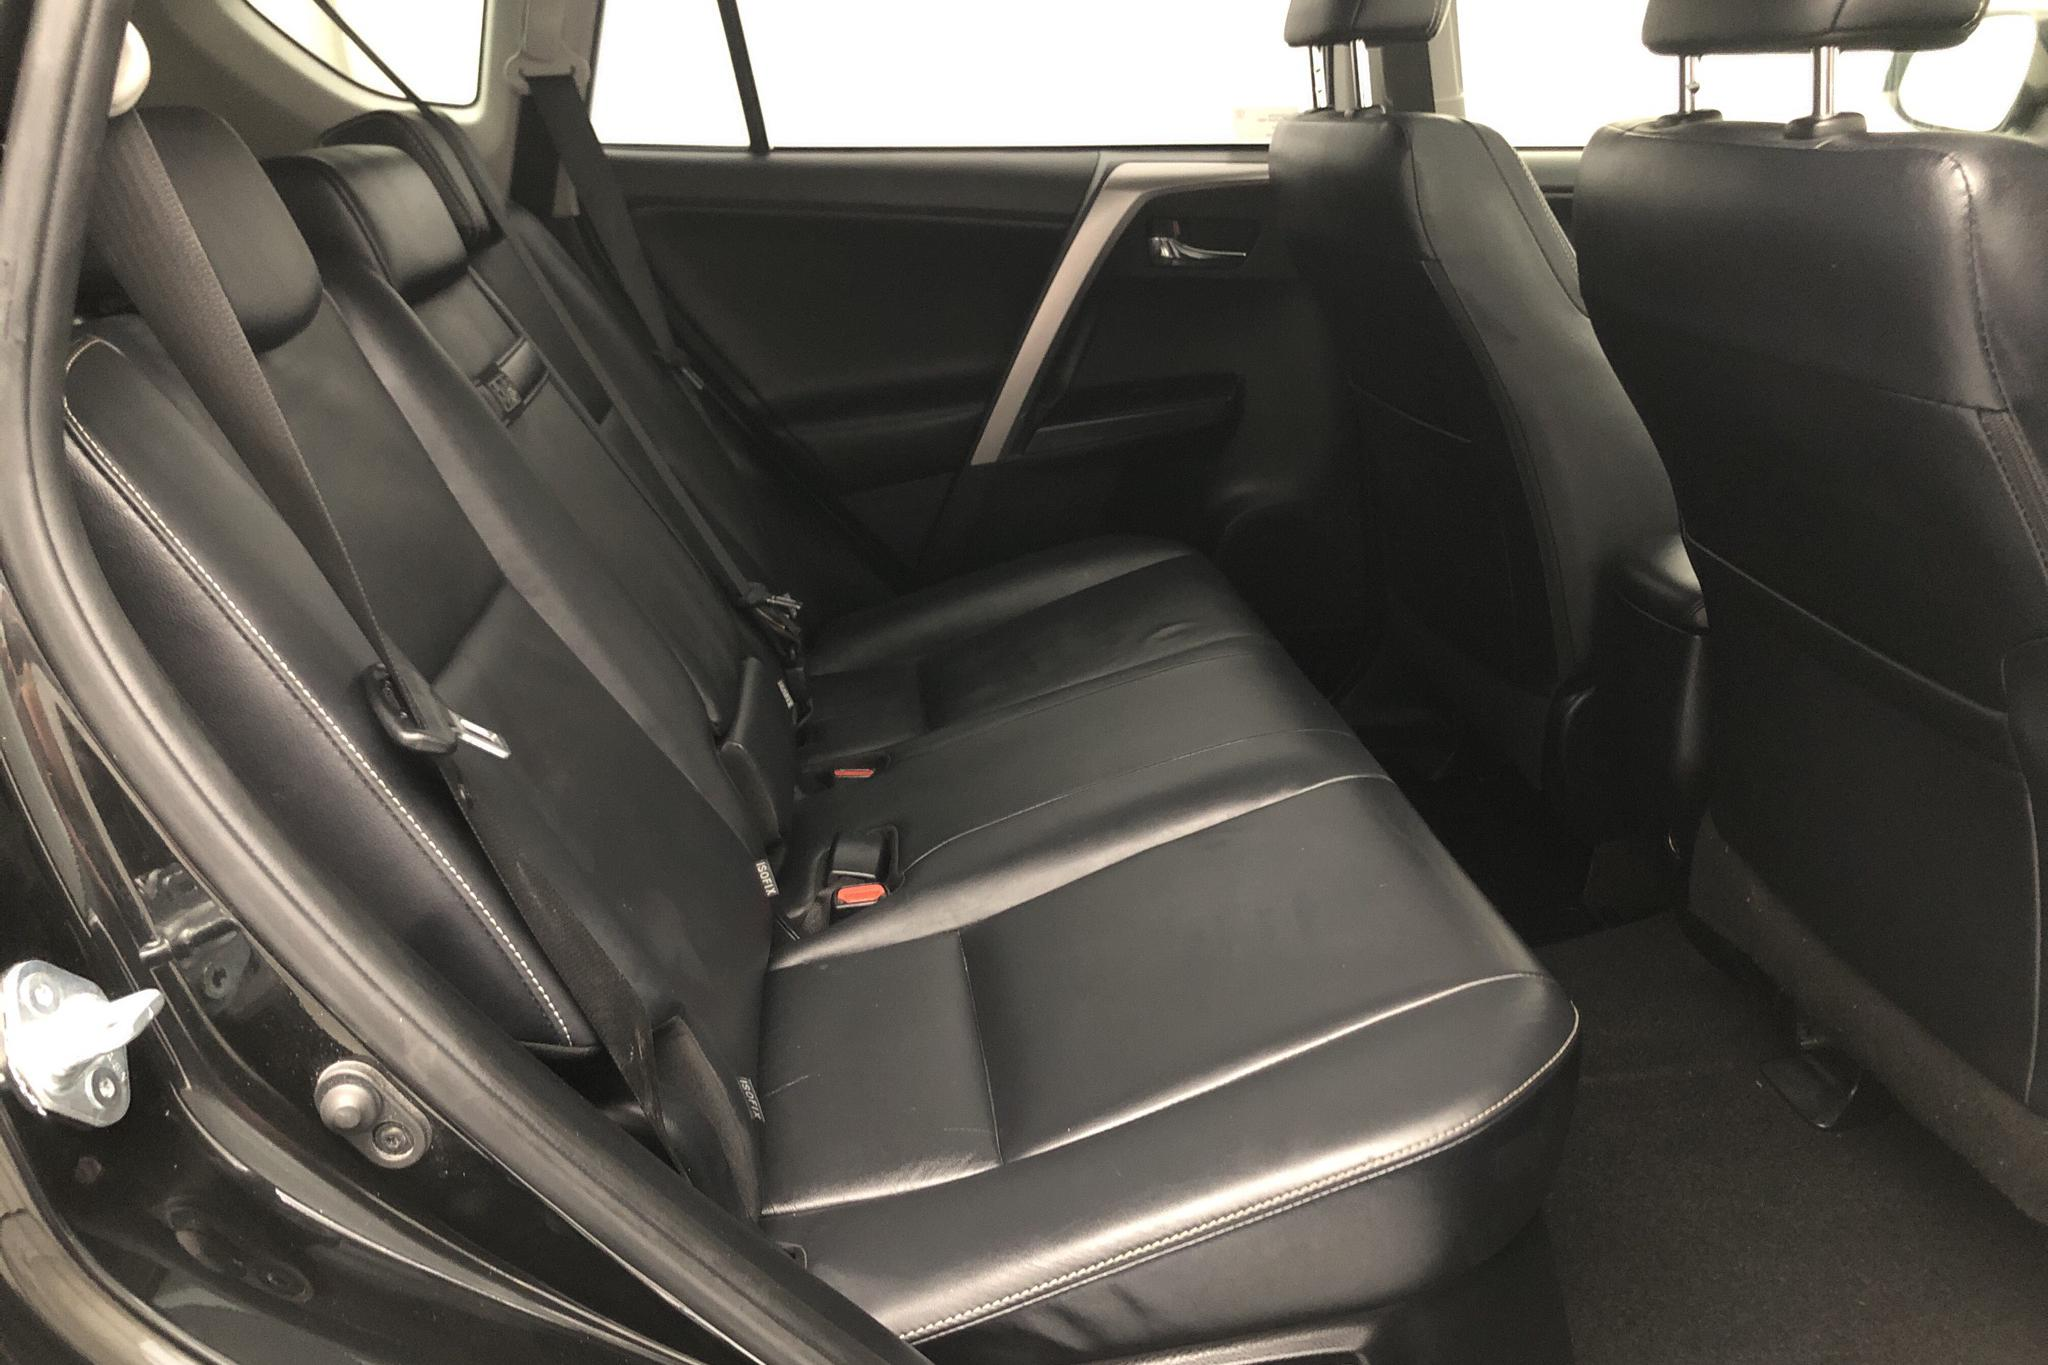 Toyota RAV4 2.5 HSD AWD (197hk) - 6 906 mil - Automat - svart - 2017